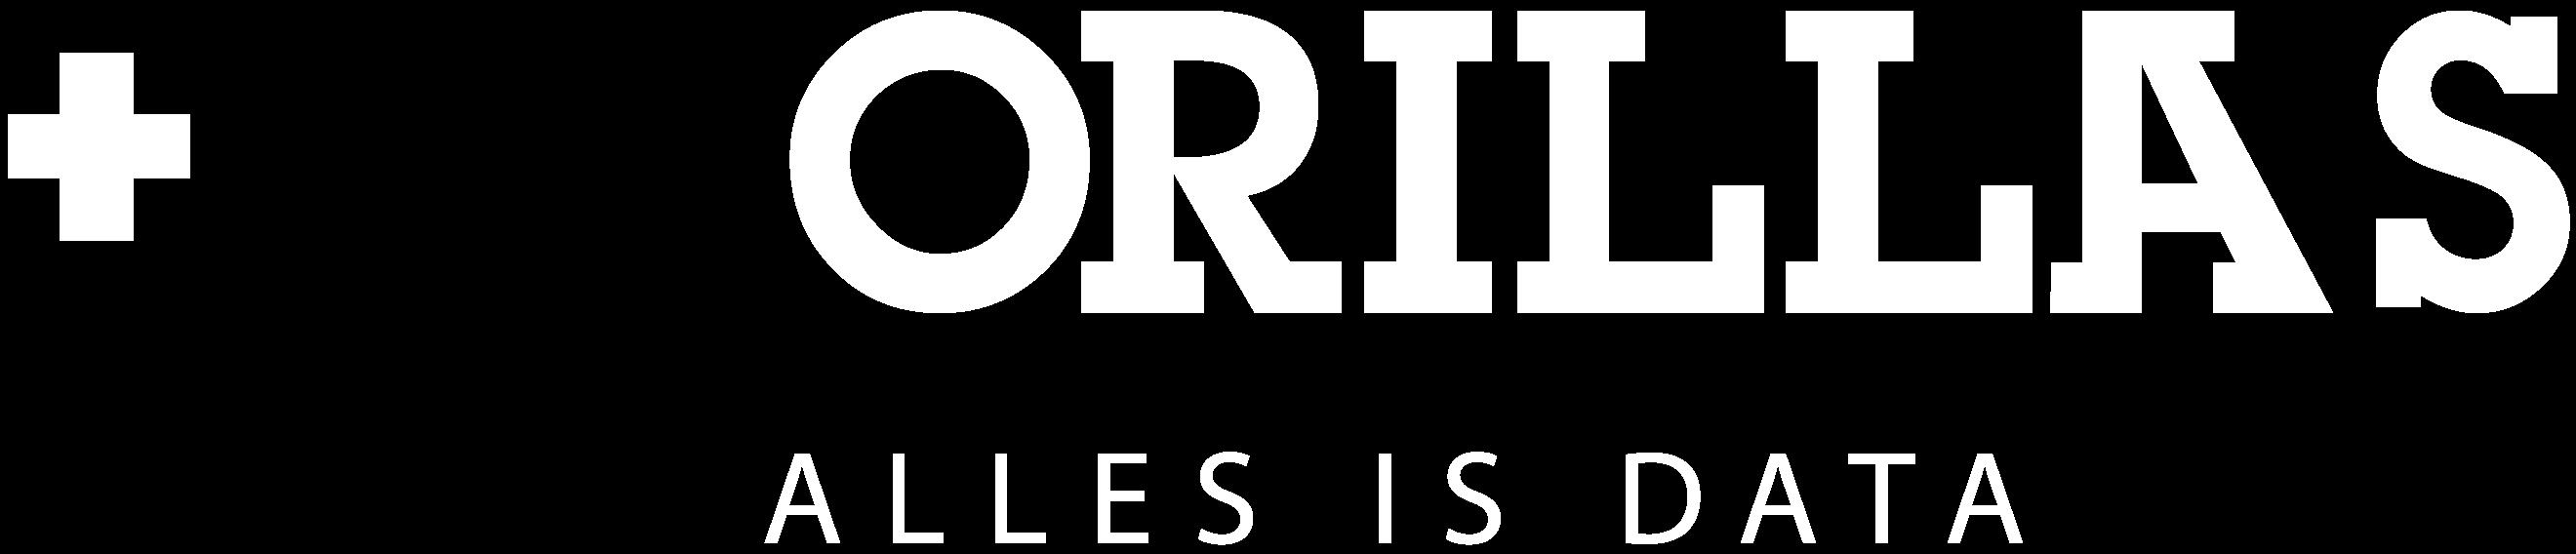 6Gorilla's logo